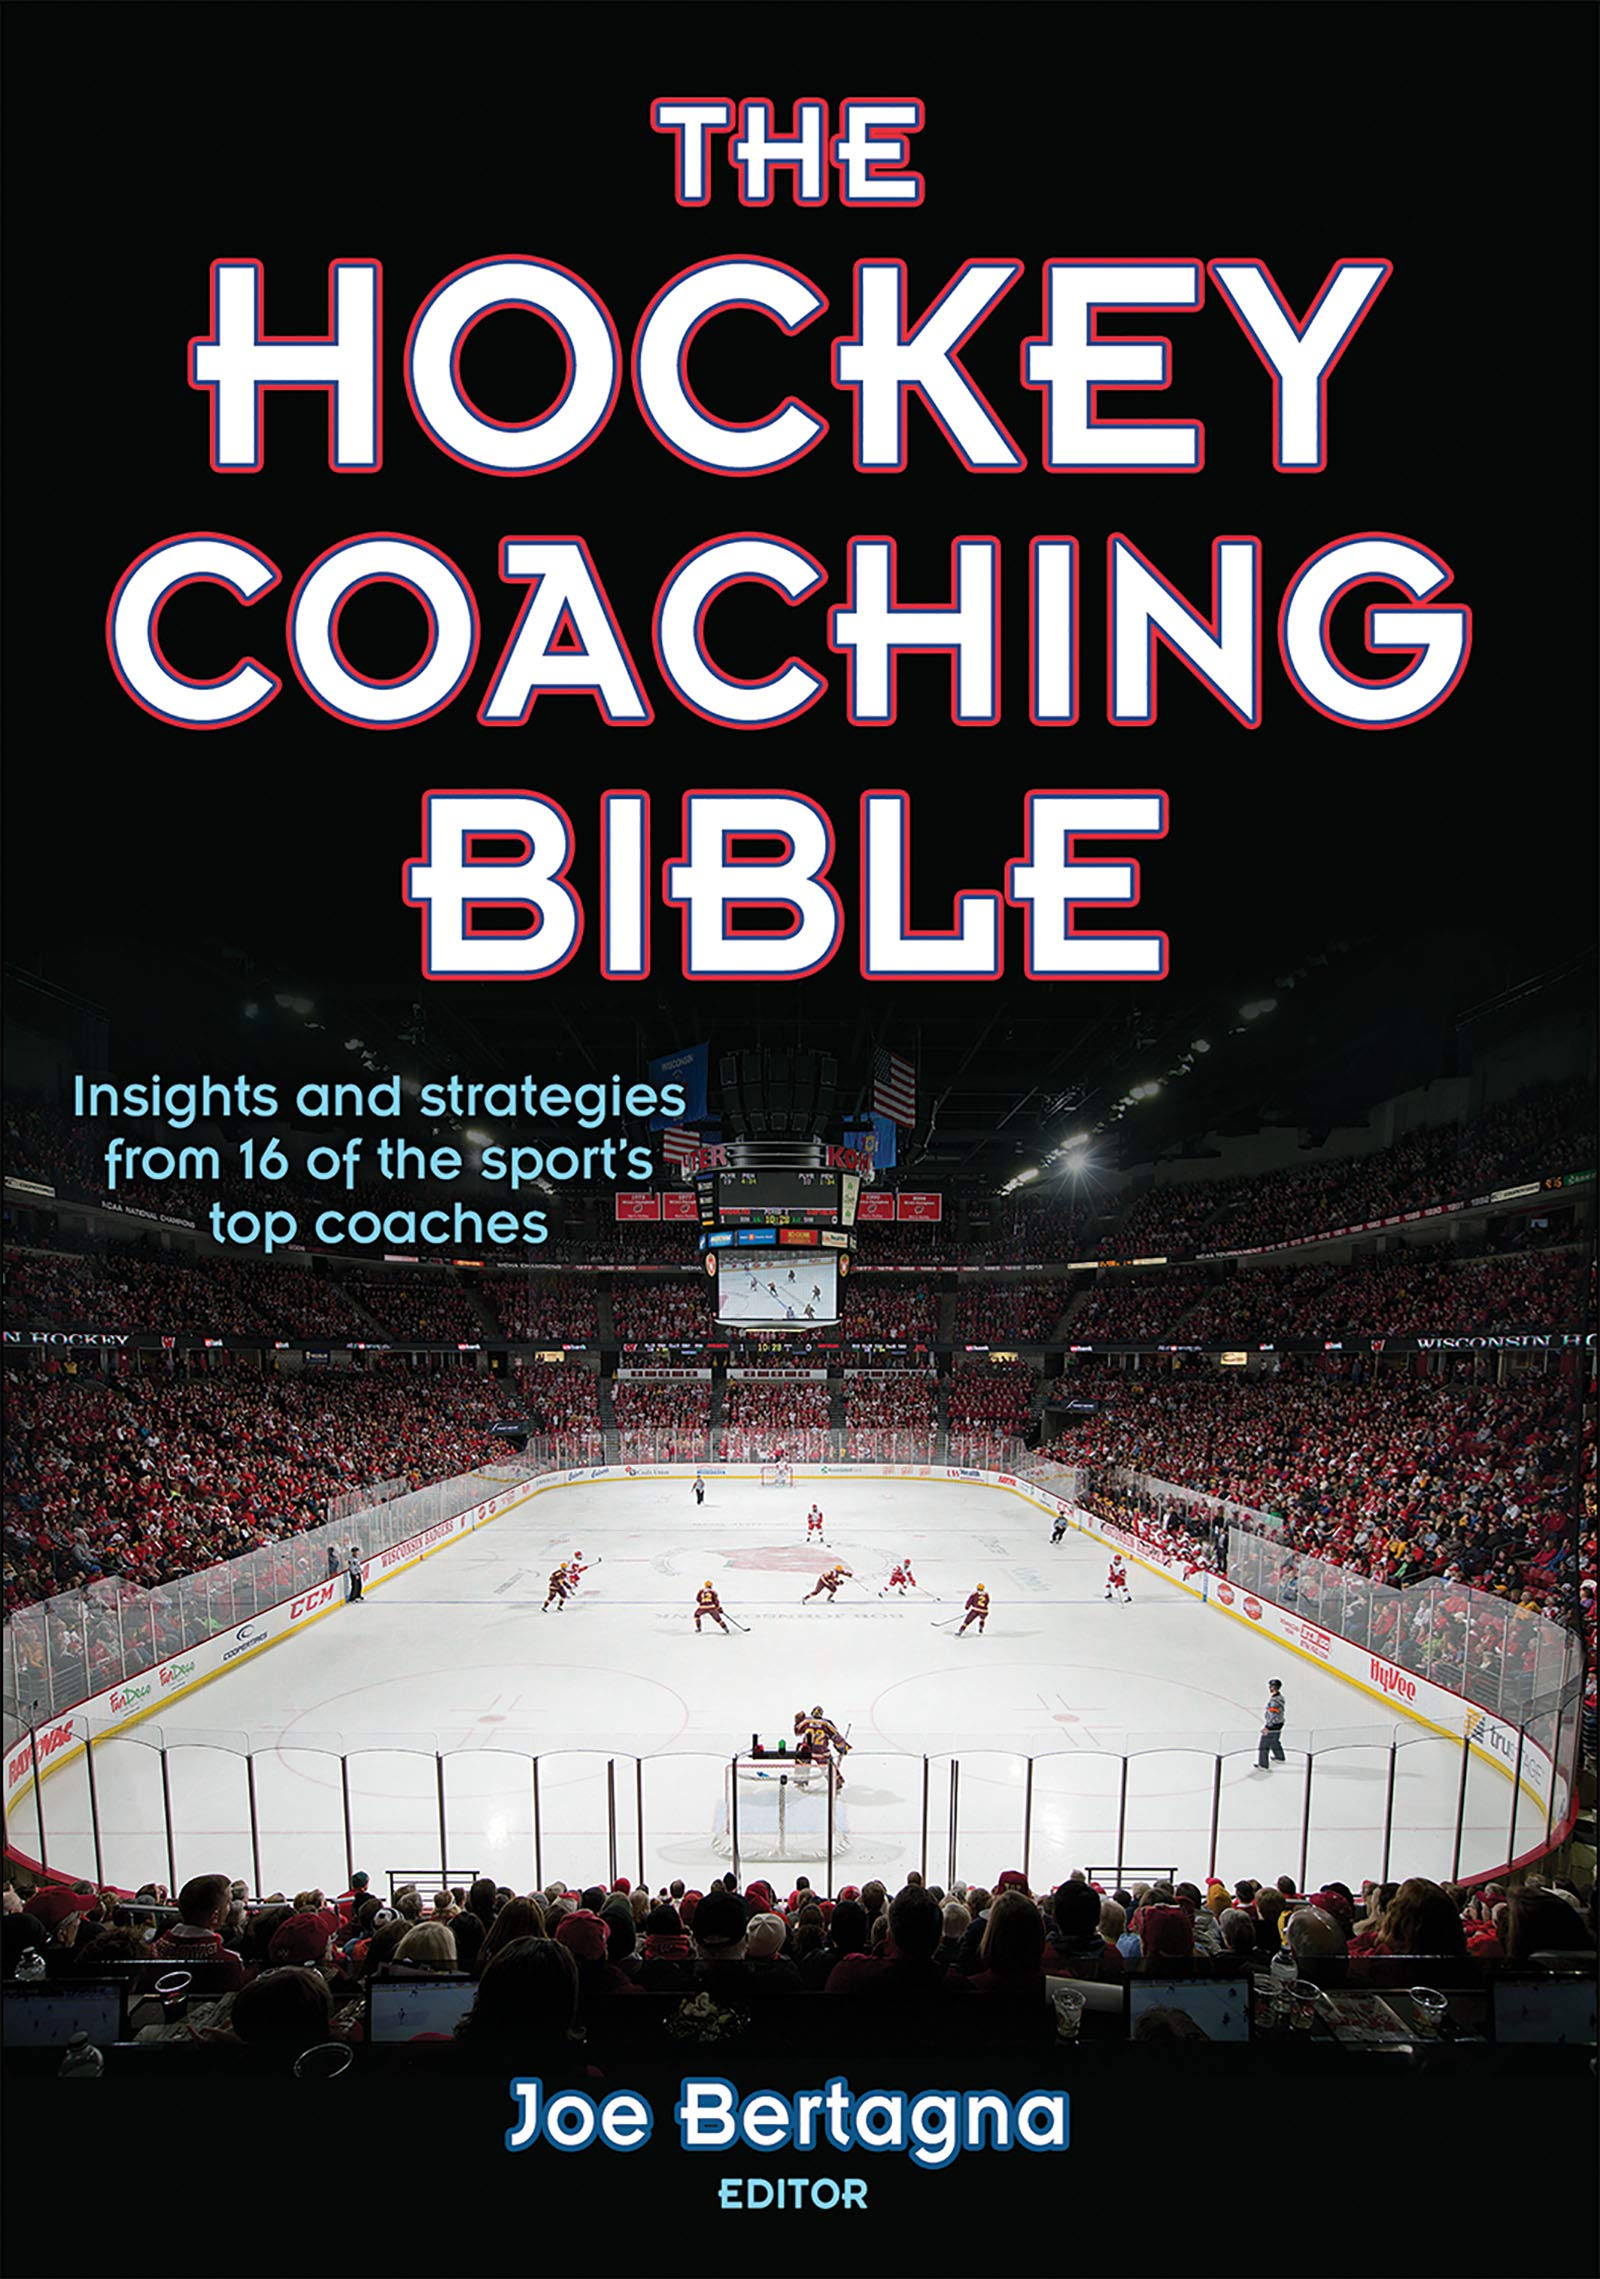 The Hockey Coaching Bible: Joe Bertagna: 9780736062015: Amazon.com: Books